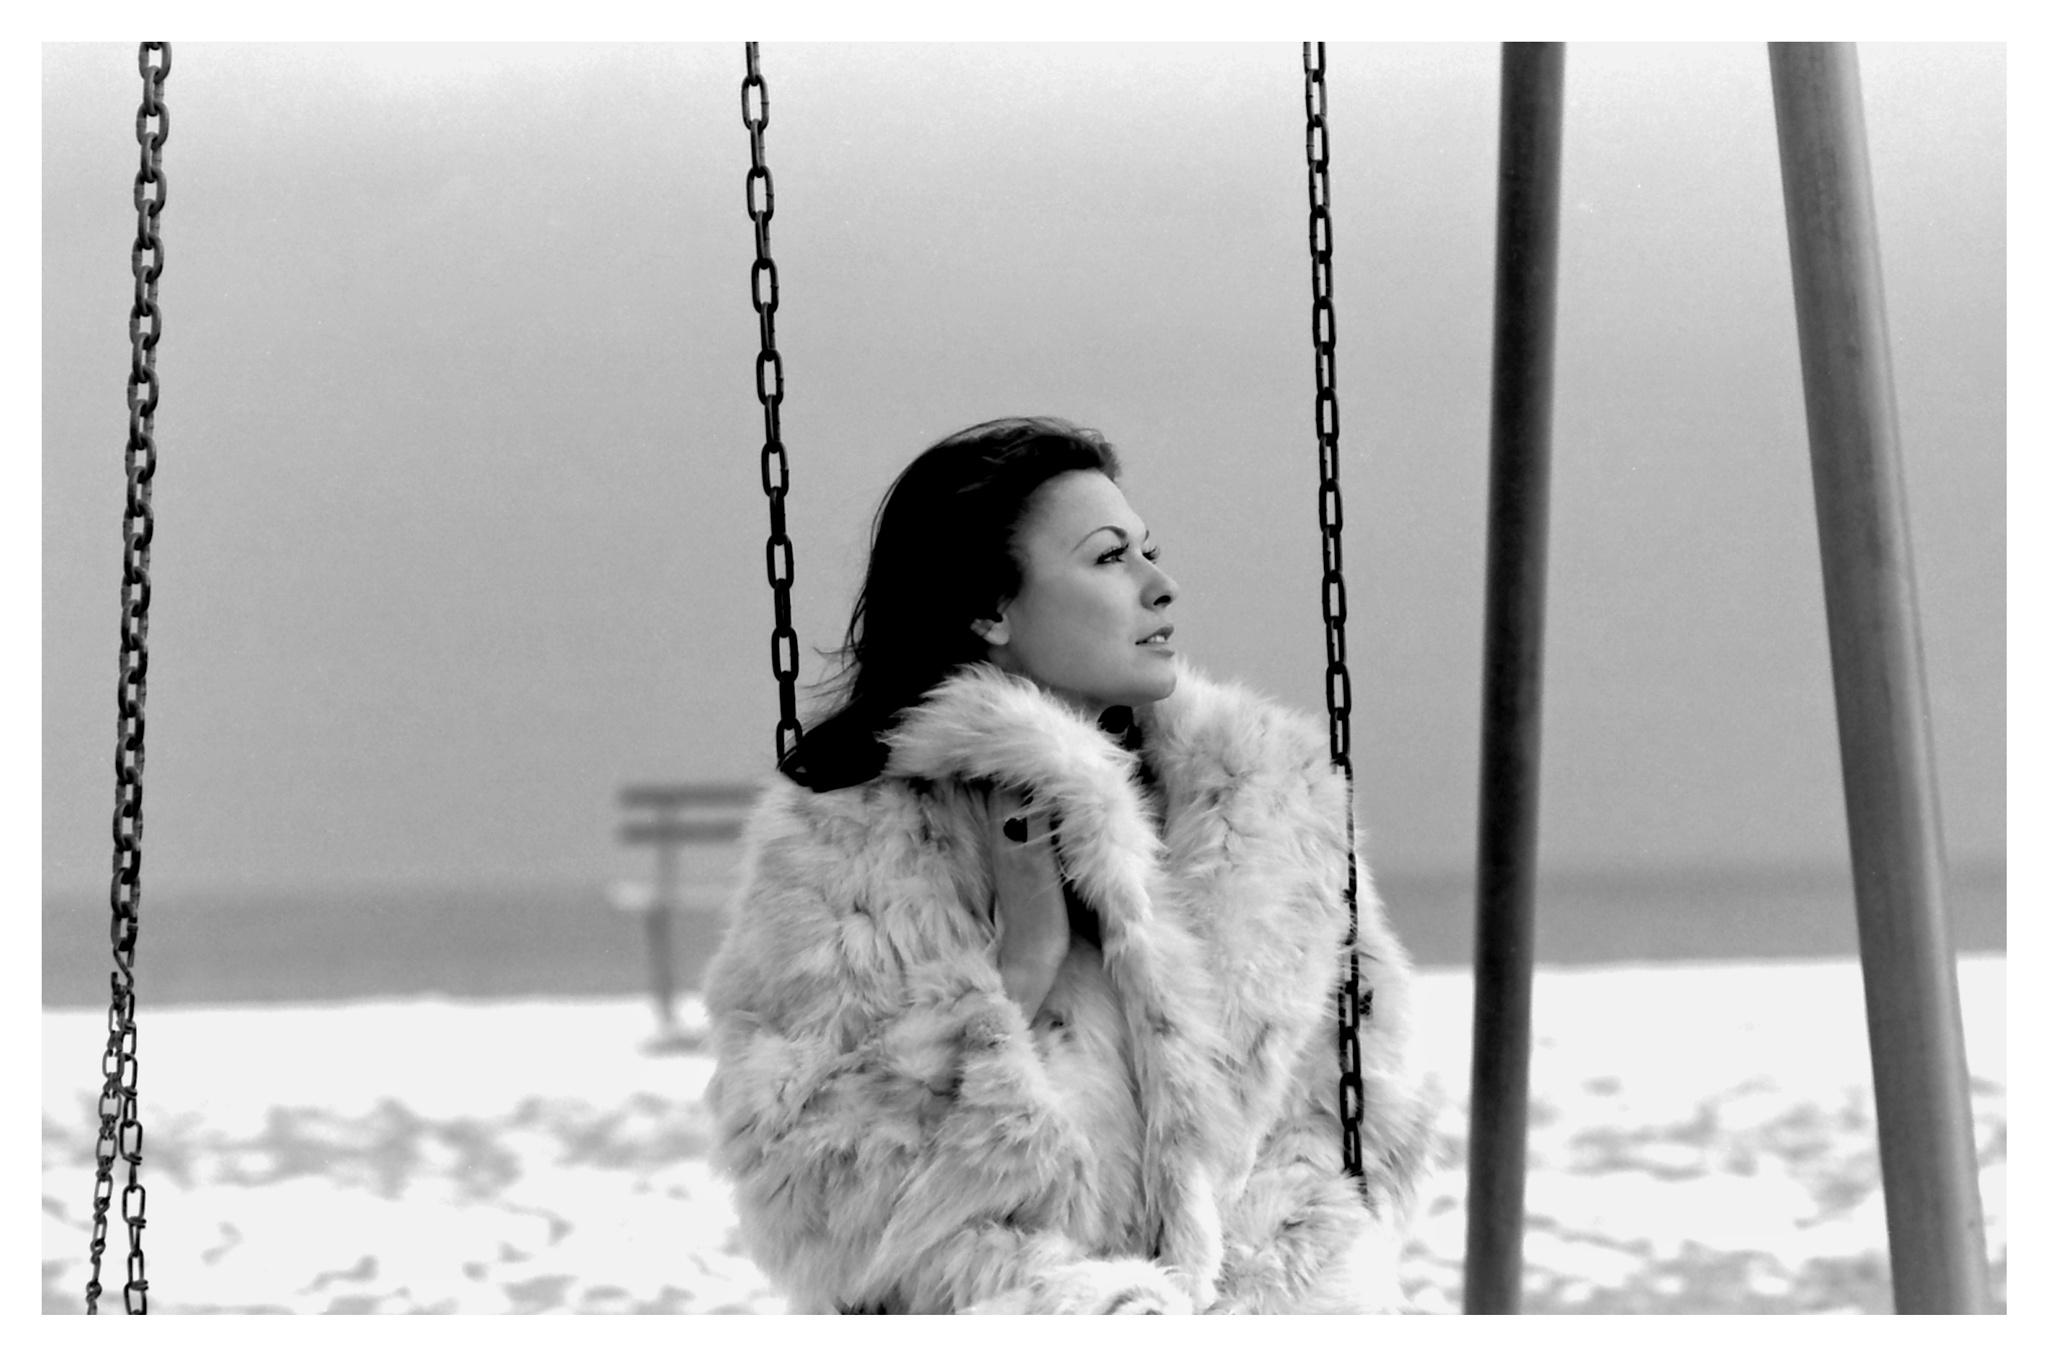 Ksenia_Winter by Peterjcb